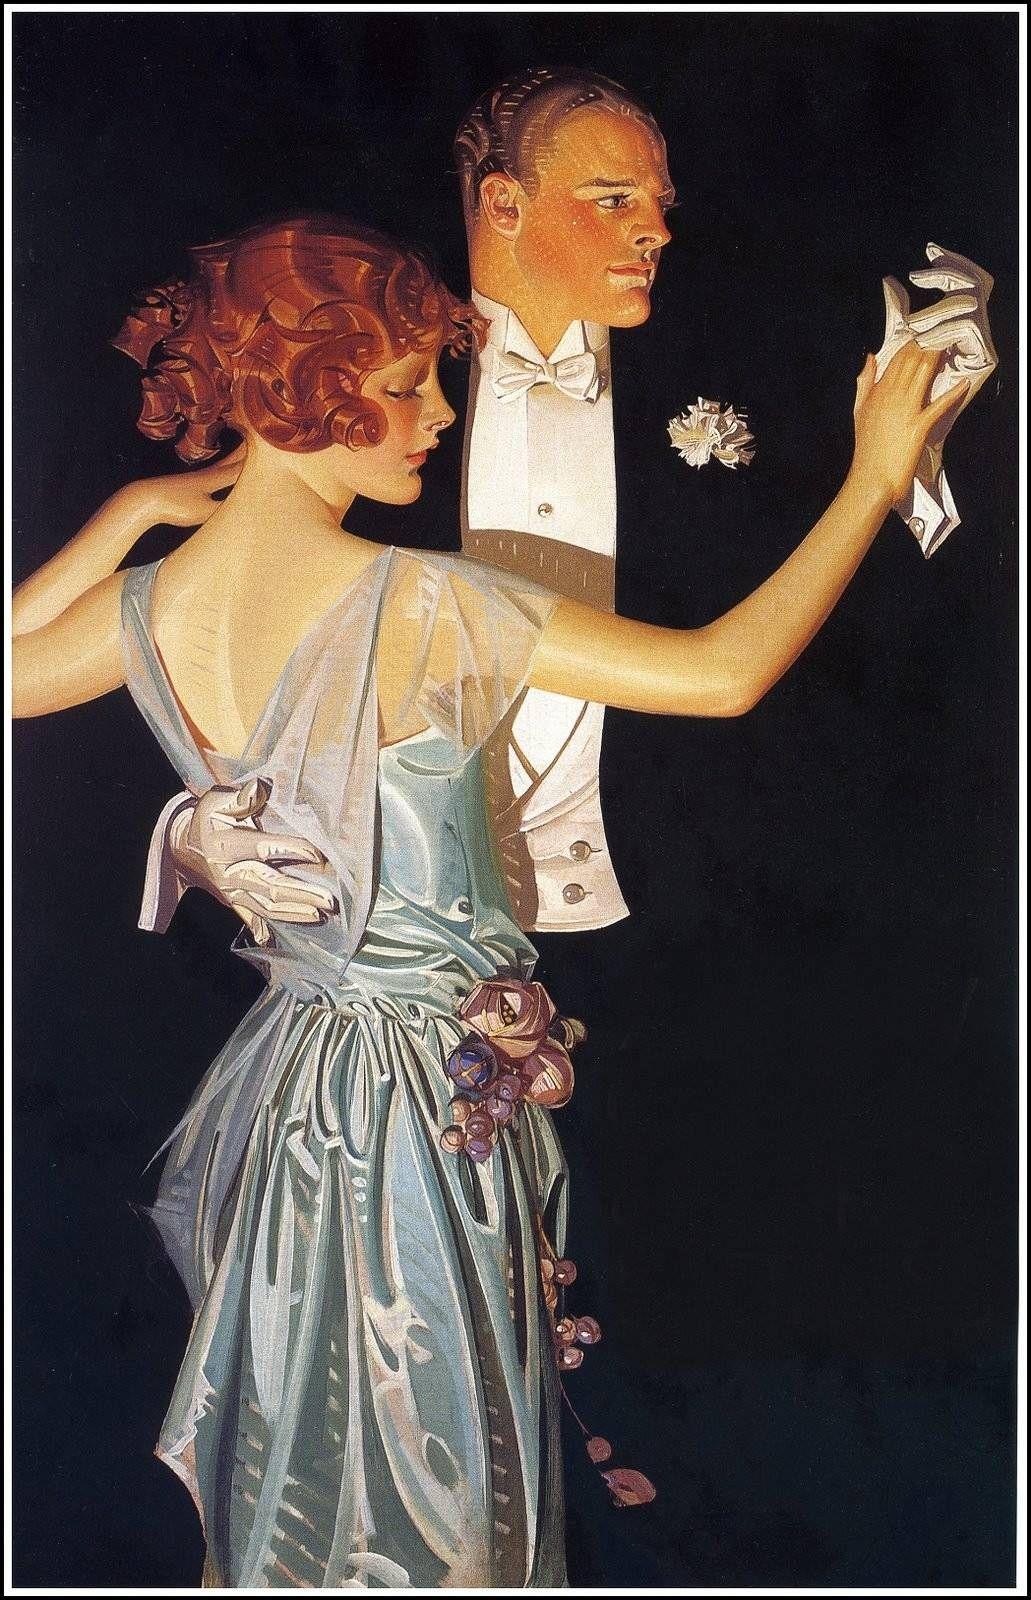 Man Woman Dancing - Joseph Christian Leyendecker